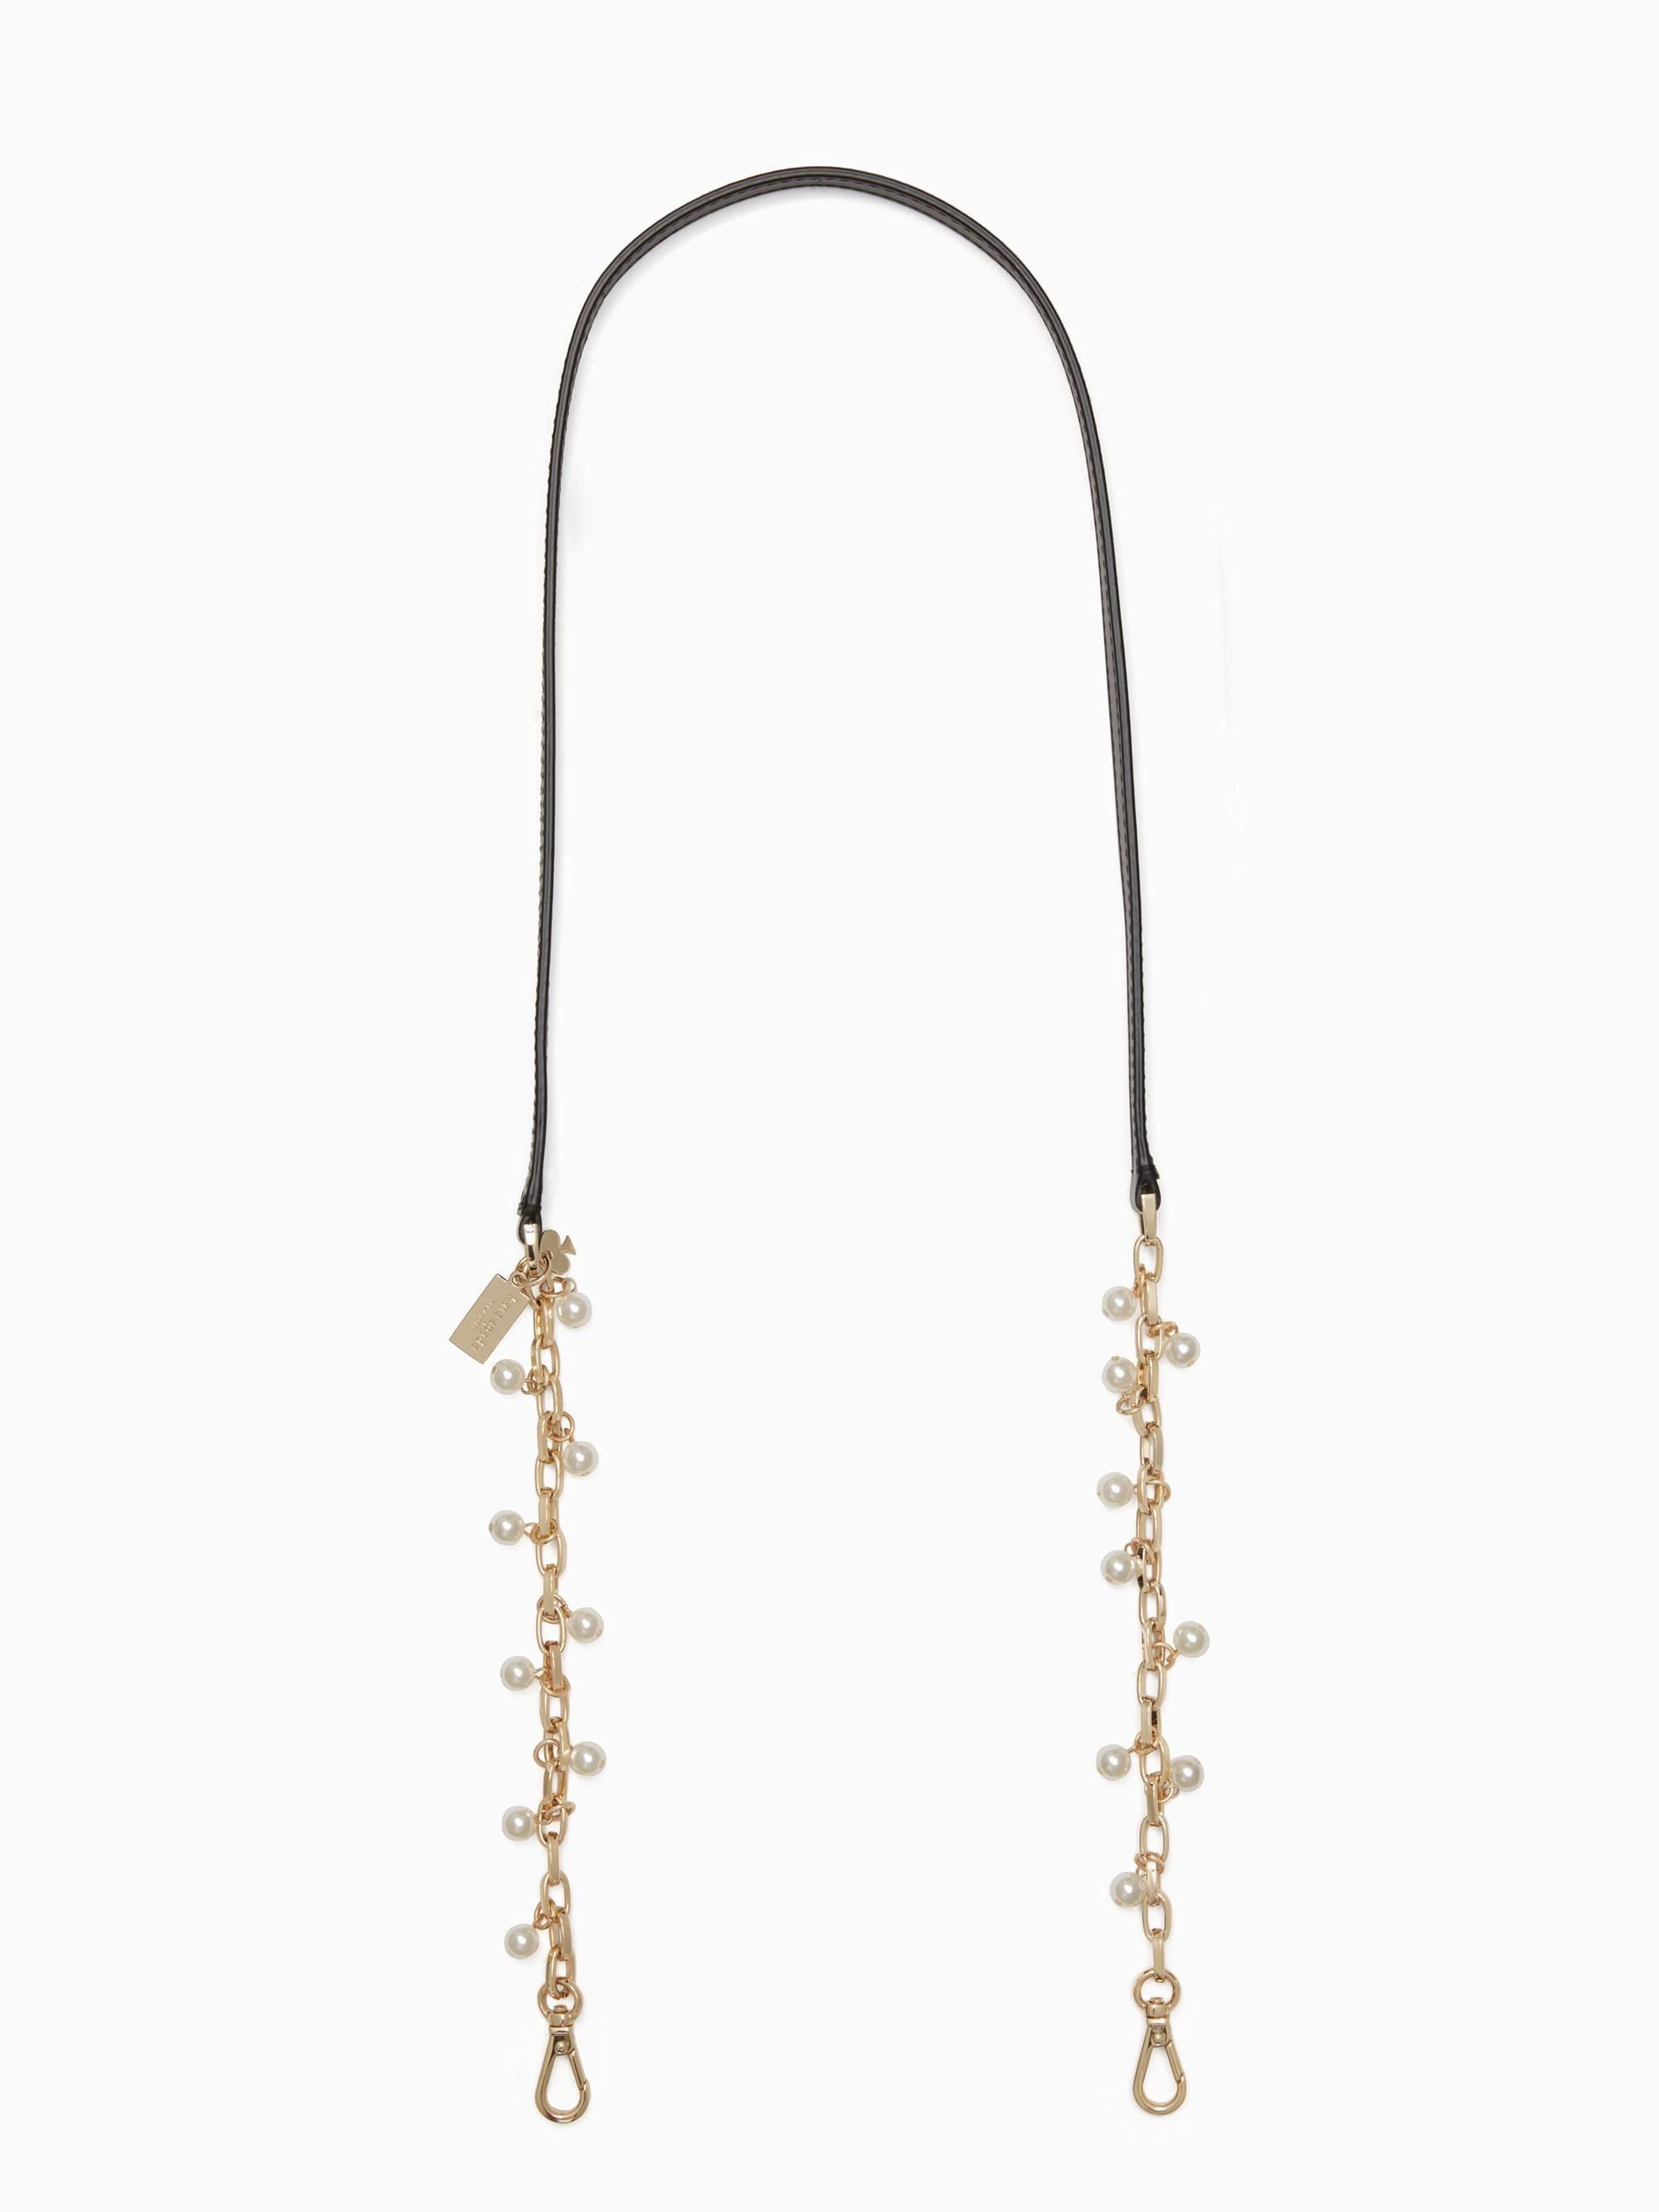 Kate Spade Make It Mine Pearl Chain Strap In Black